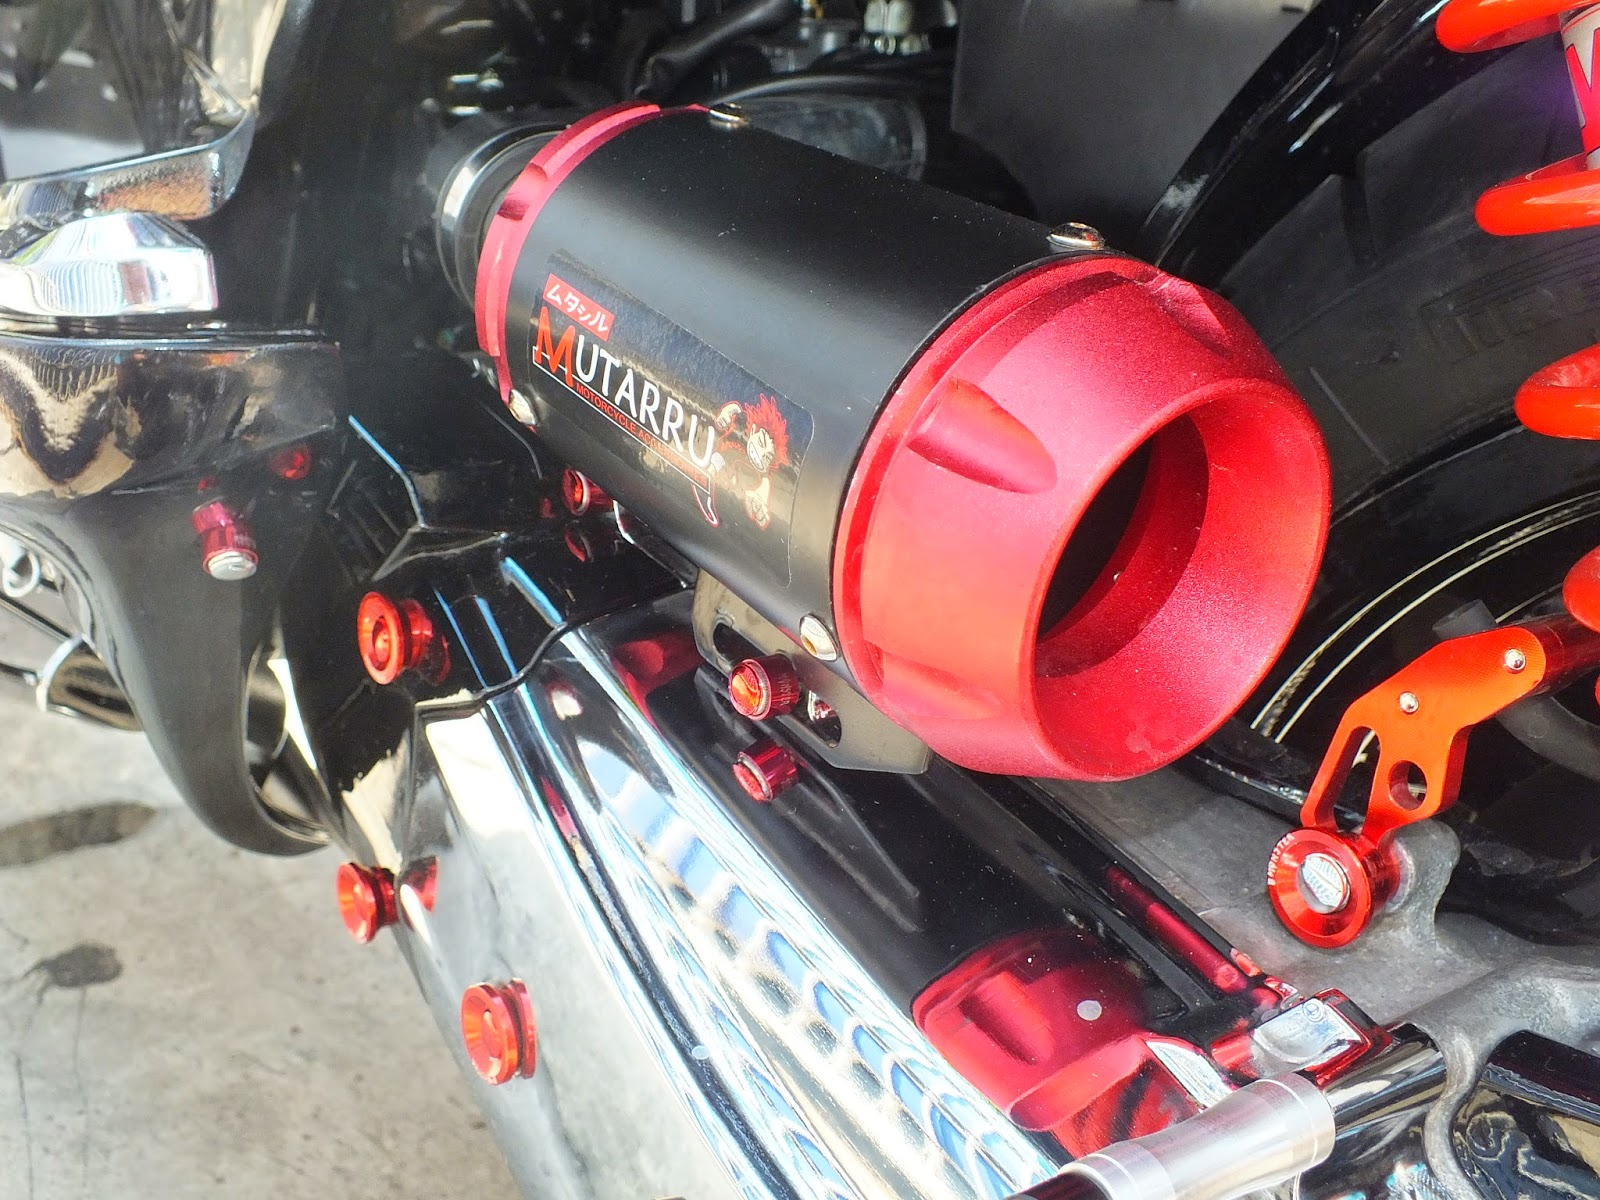 Modifikasi Filter Udara Vario 125 Kumpulan Modifikasi Motor Vario